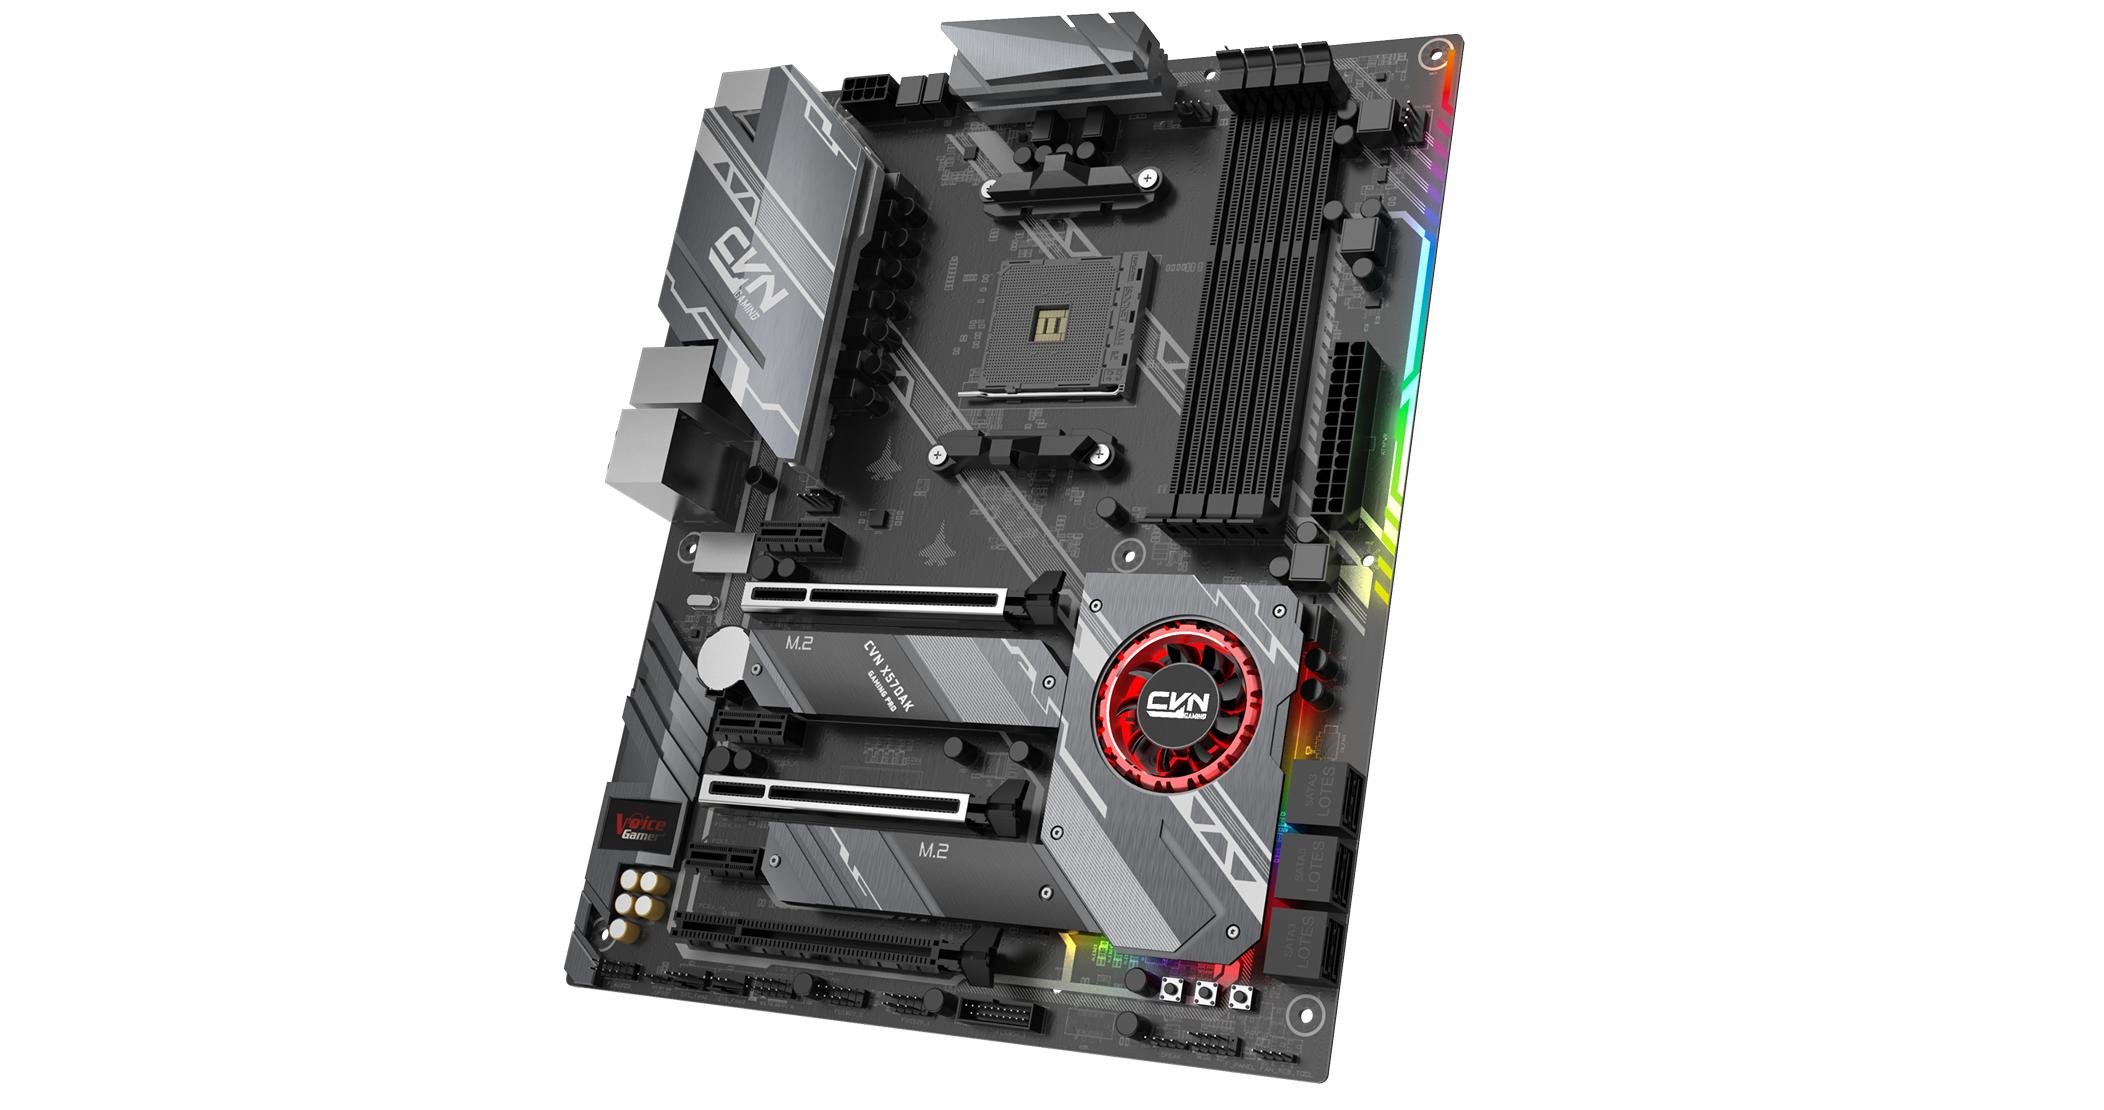 Colorful CVNX570 Gaming Pro Ryzen 3000 Leak